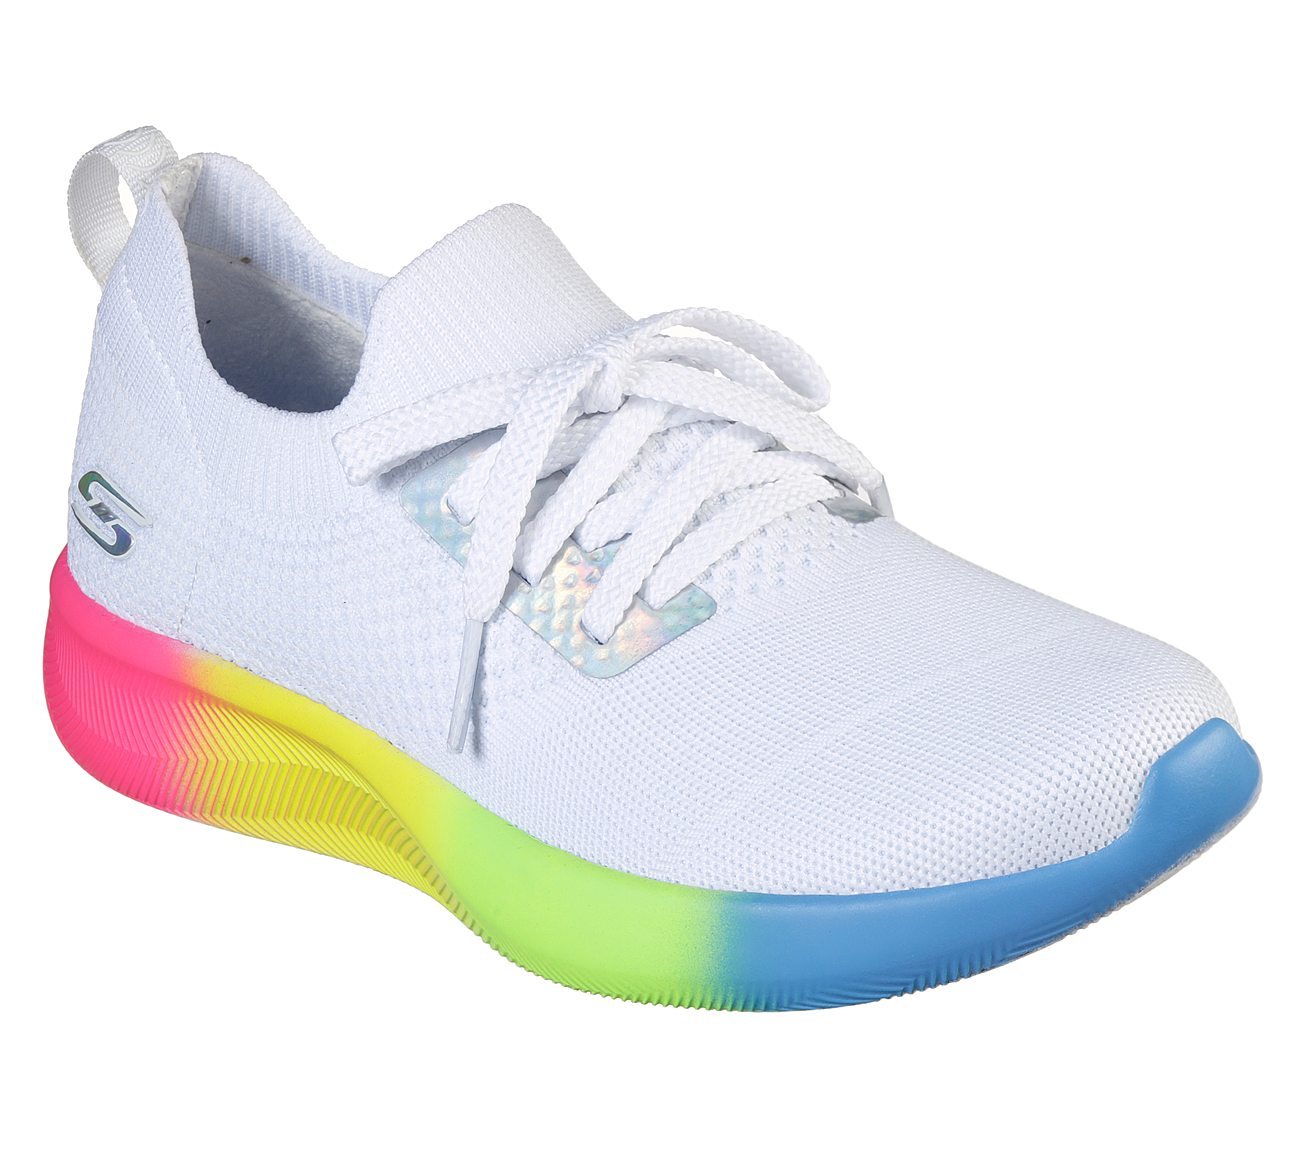 a379e51c3252 Buy skechers bobs sport squad rainbow rider bobs shoes only jpg 1300x1151 Skechers  rainbow shoes